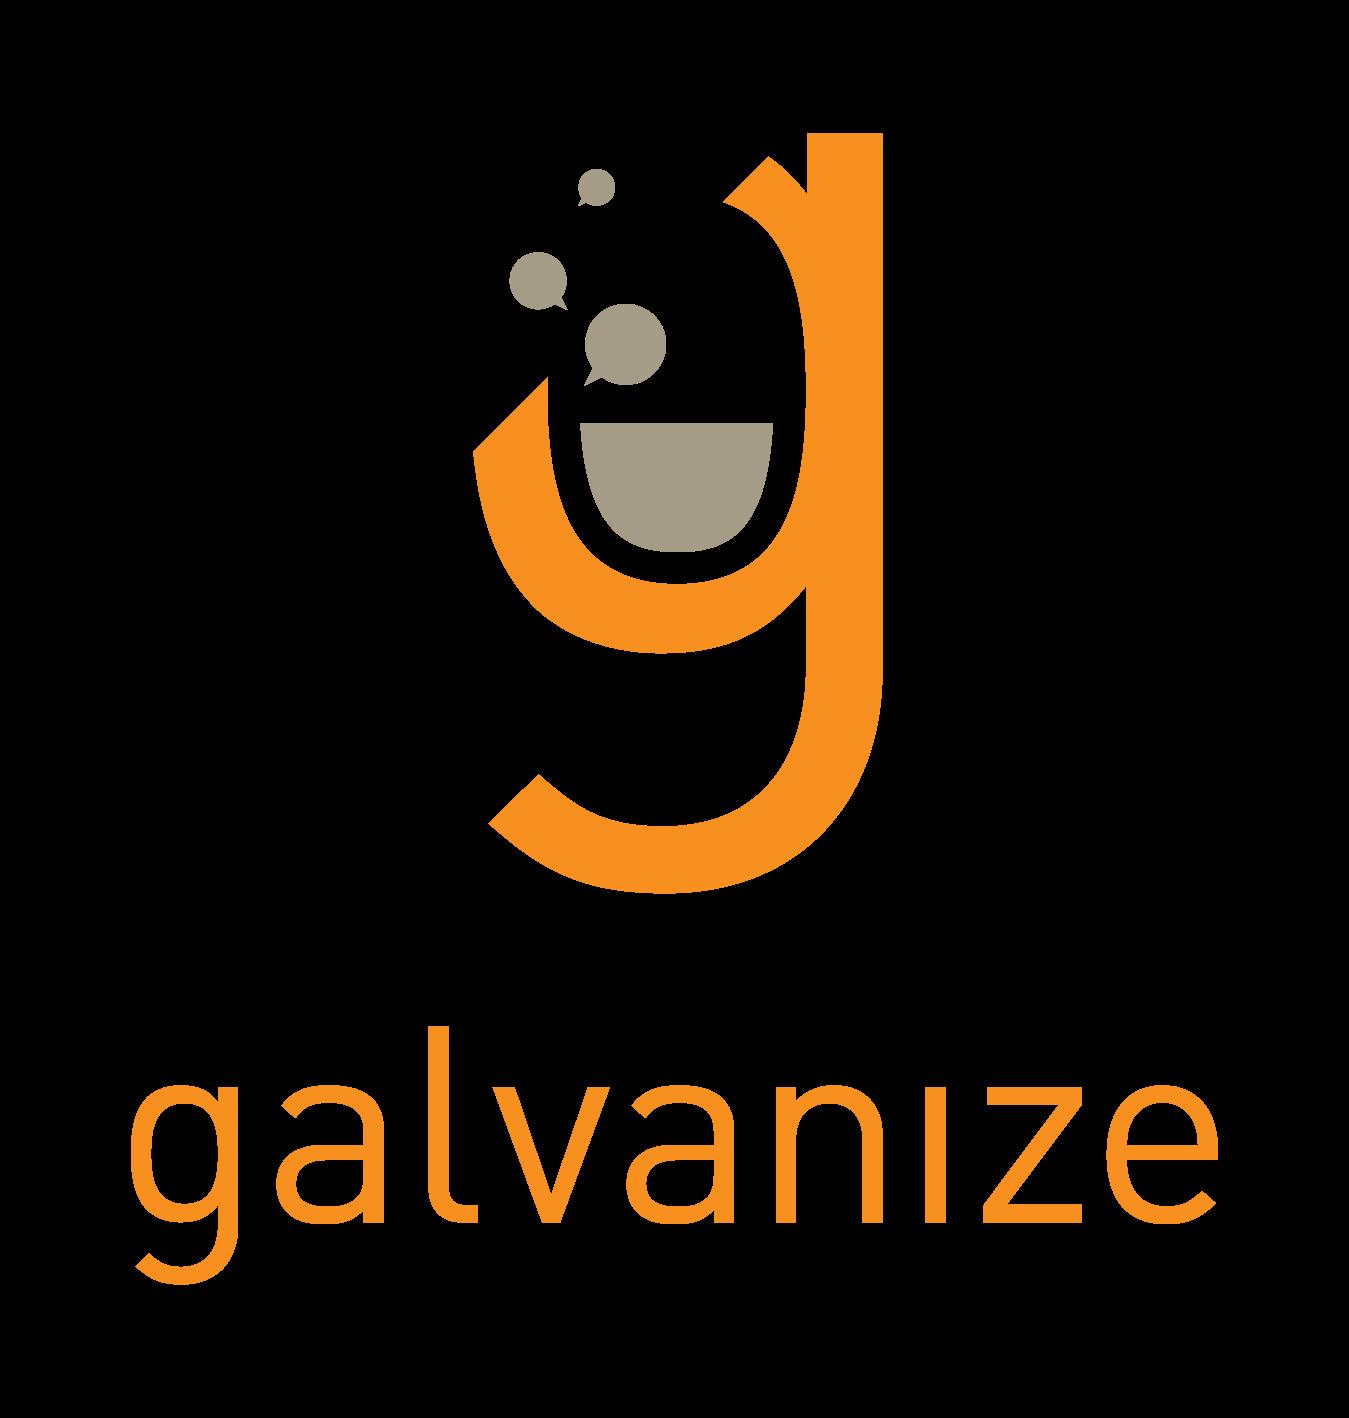 Galvanize-Galvanize-Logo-Text-_-Logo.png